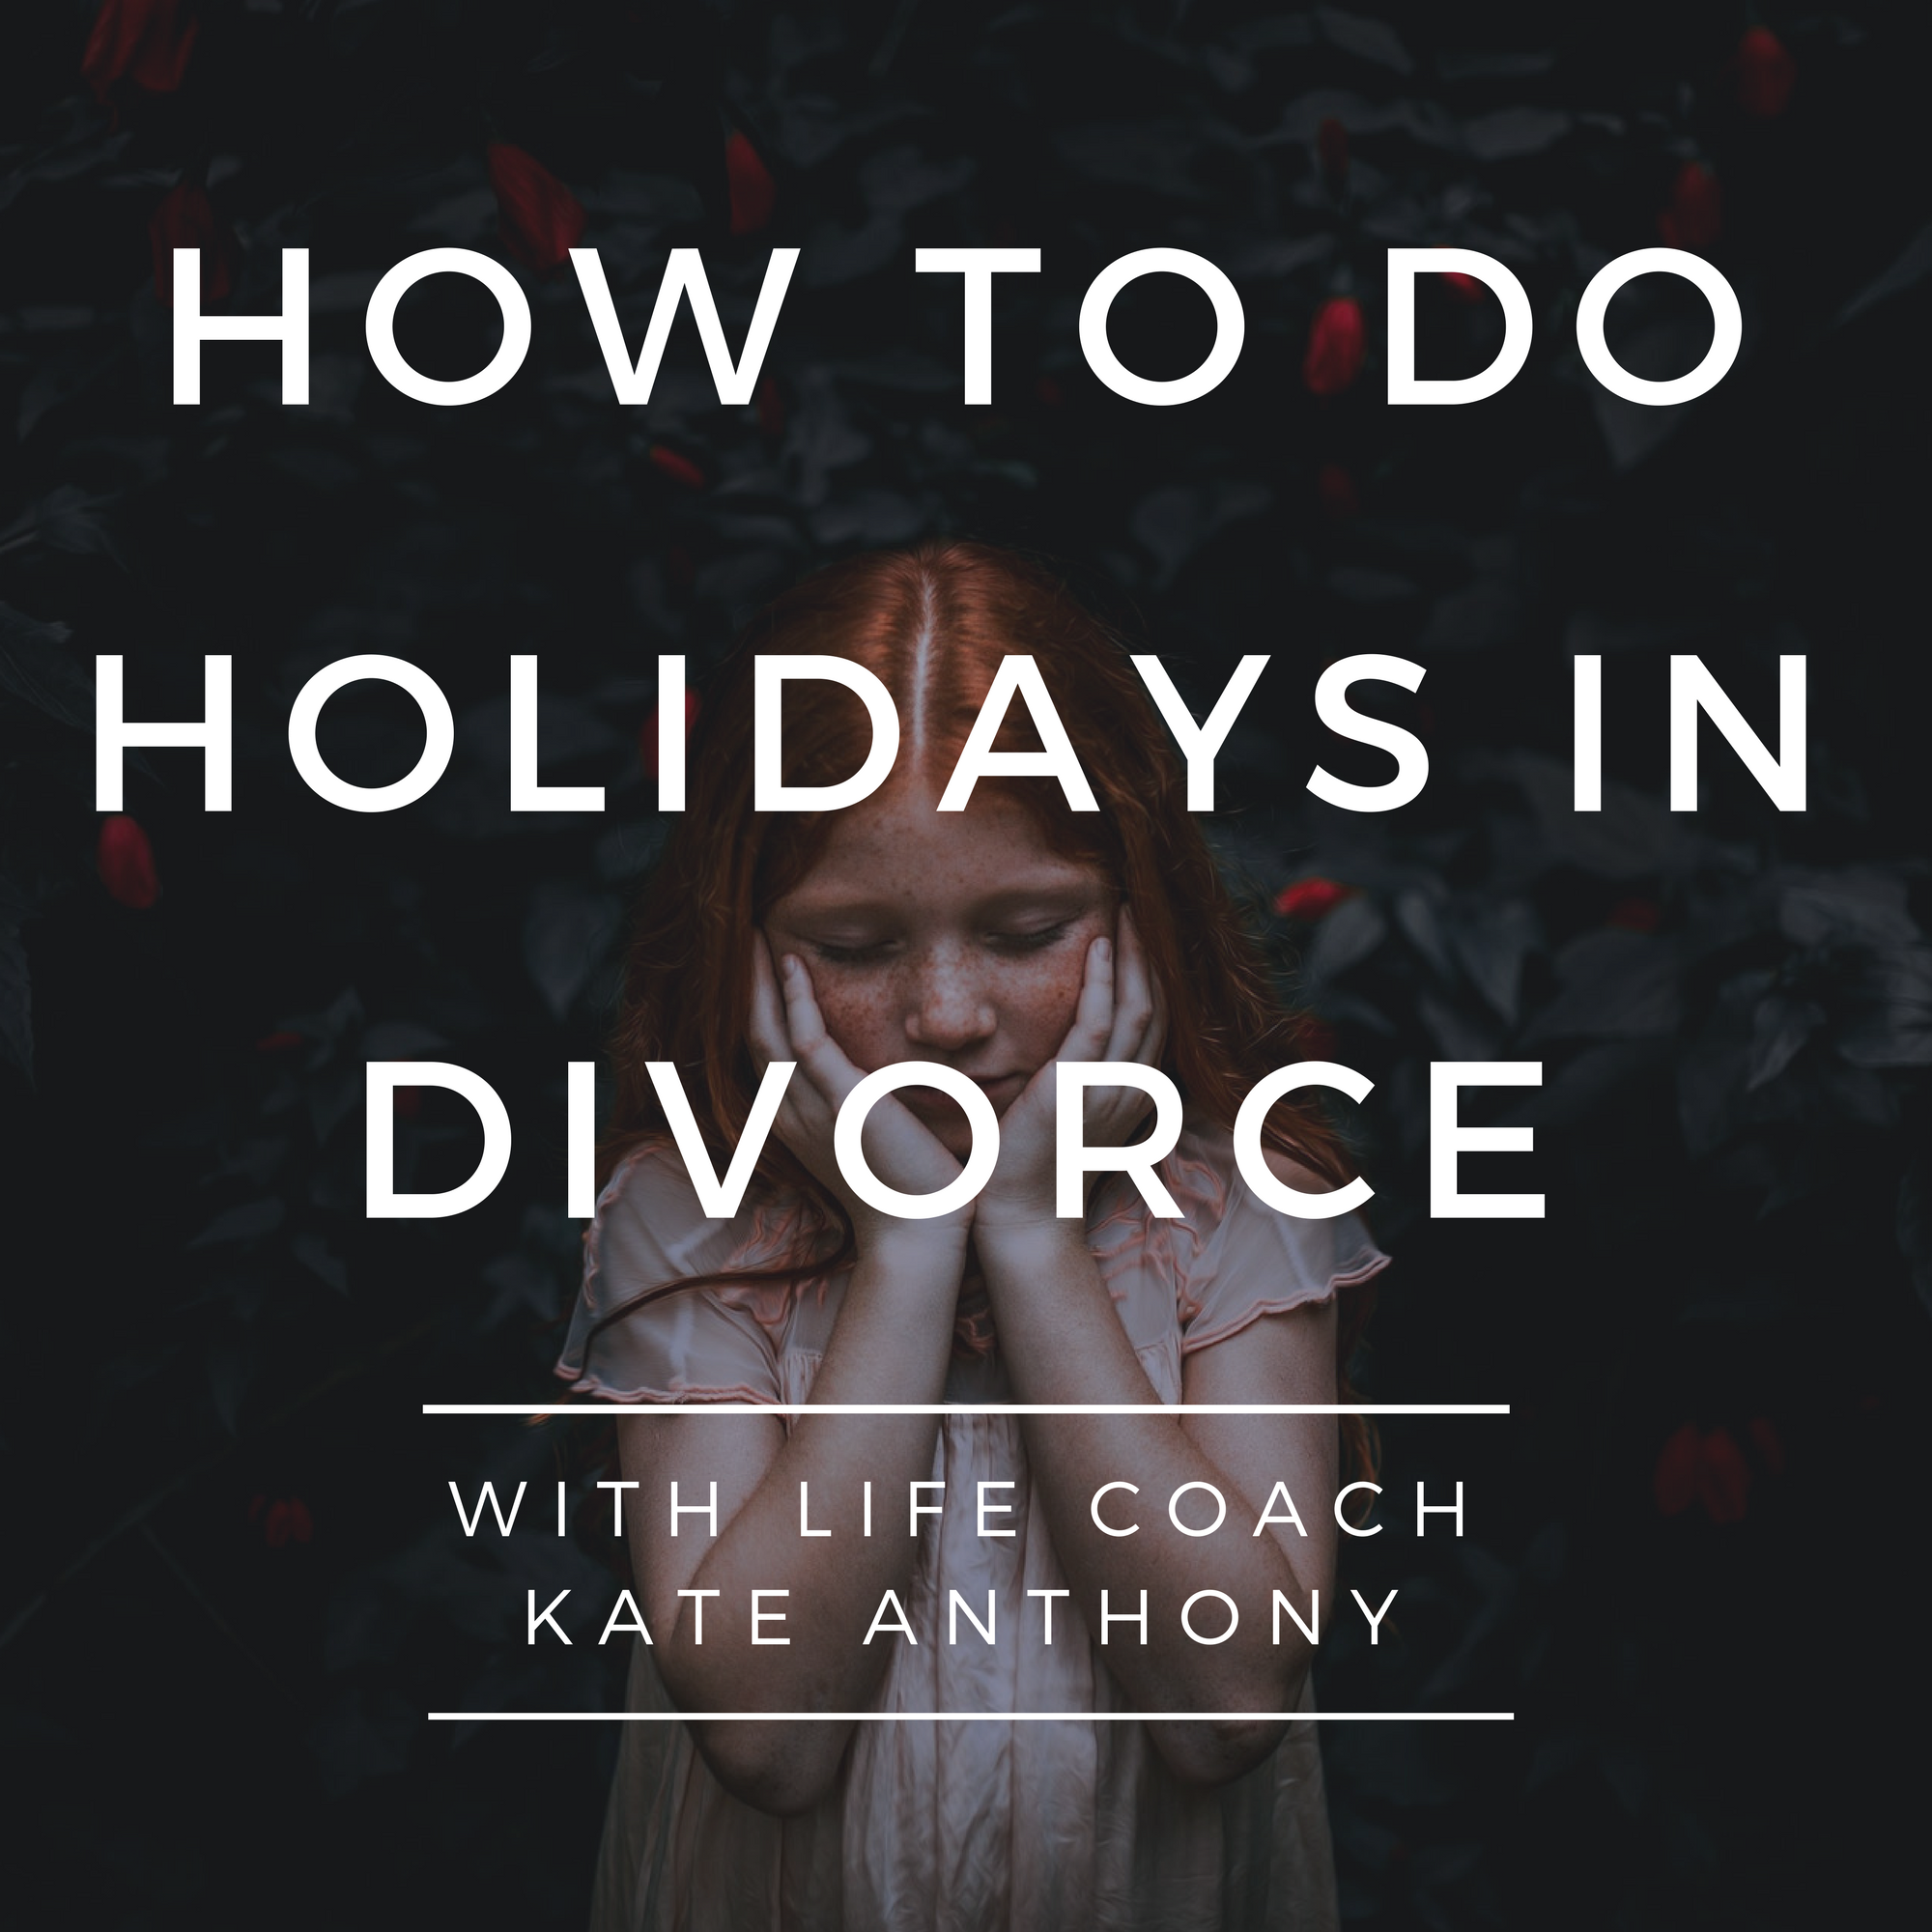 Online hookup before divorce is final